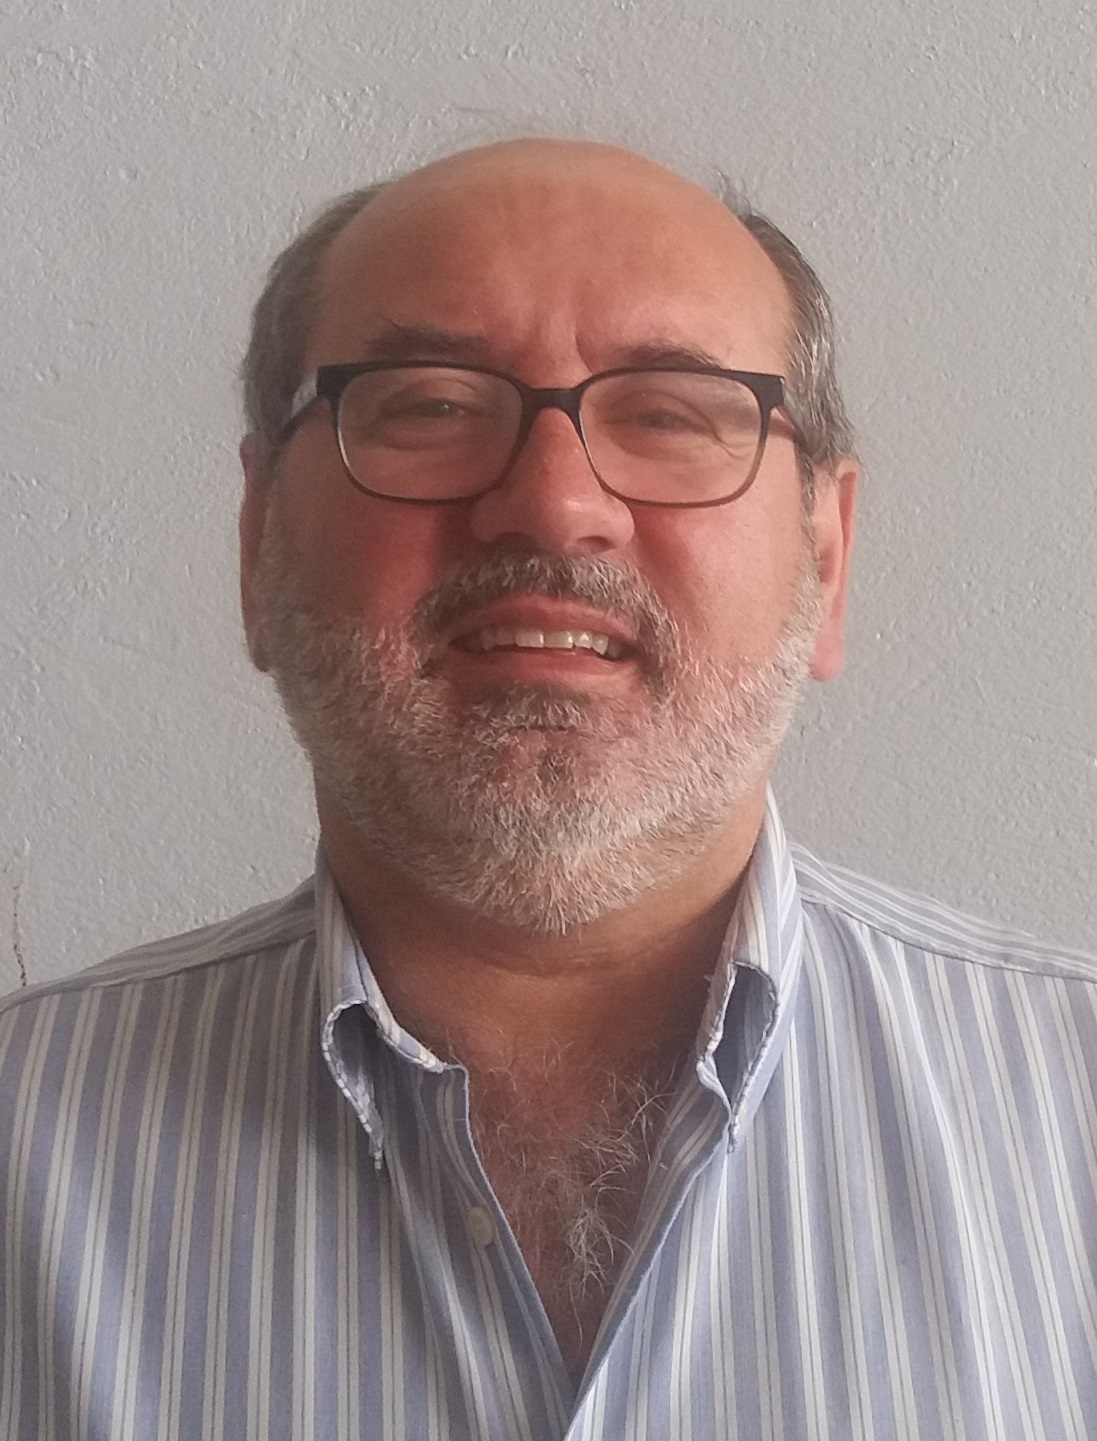 Juan Carlos de la Riva